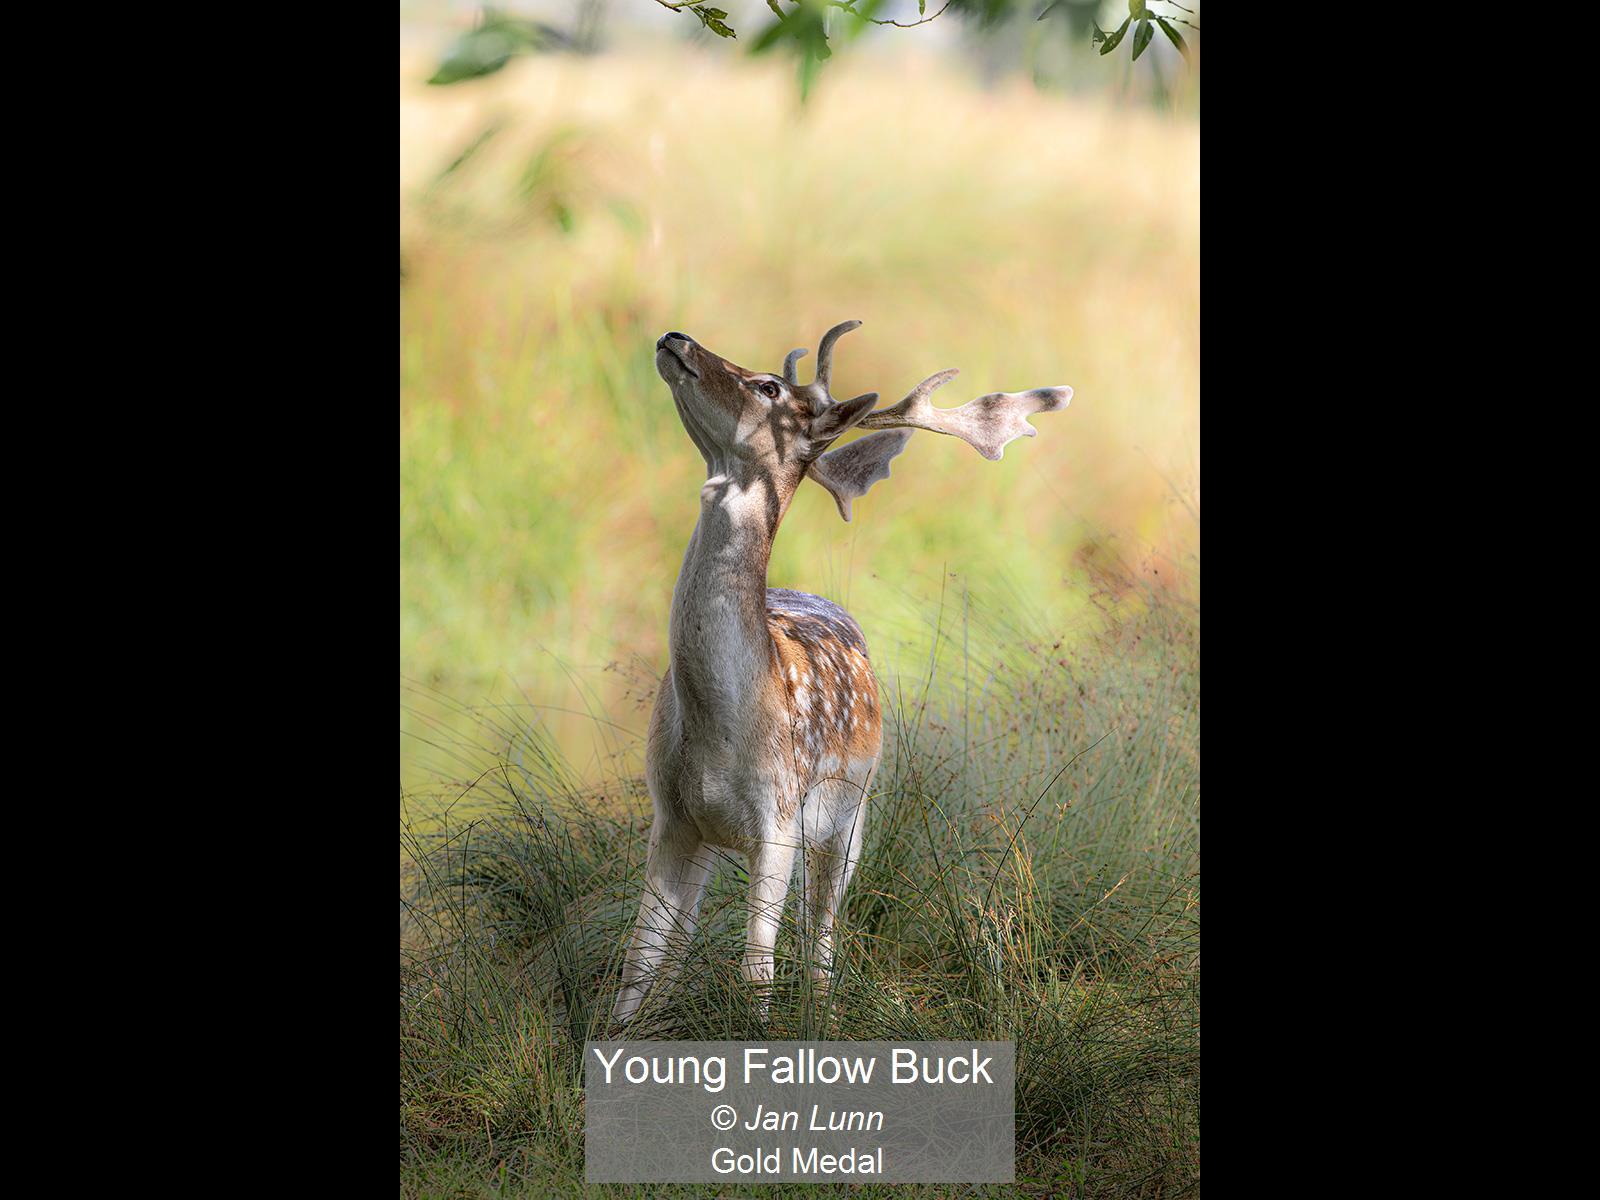 Young Fallow Buck_Jan Lunn_Gold